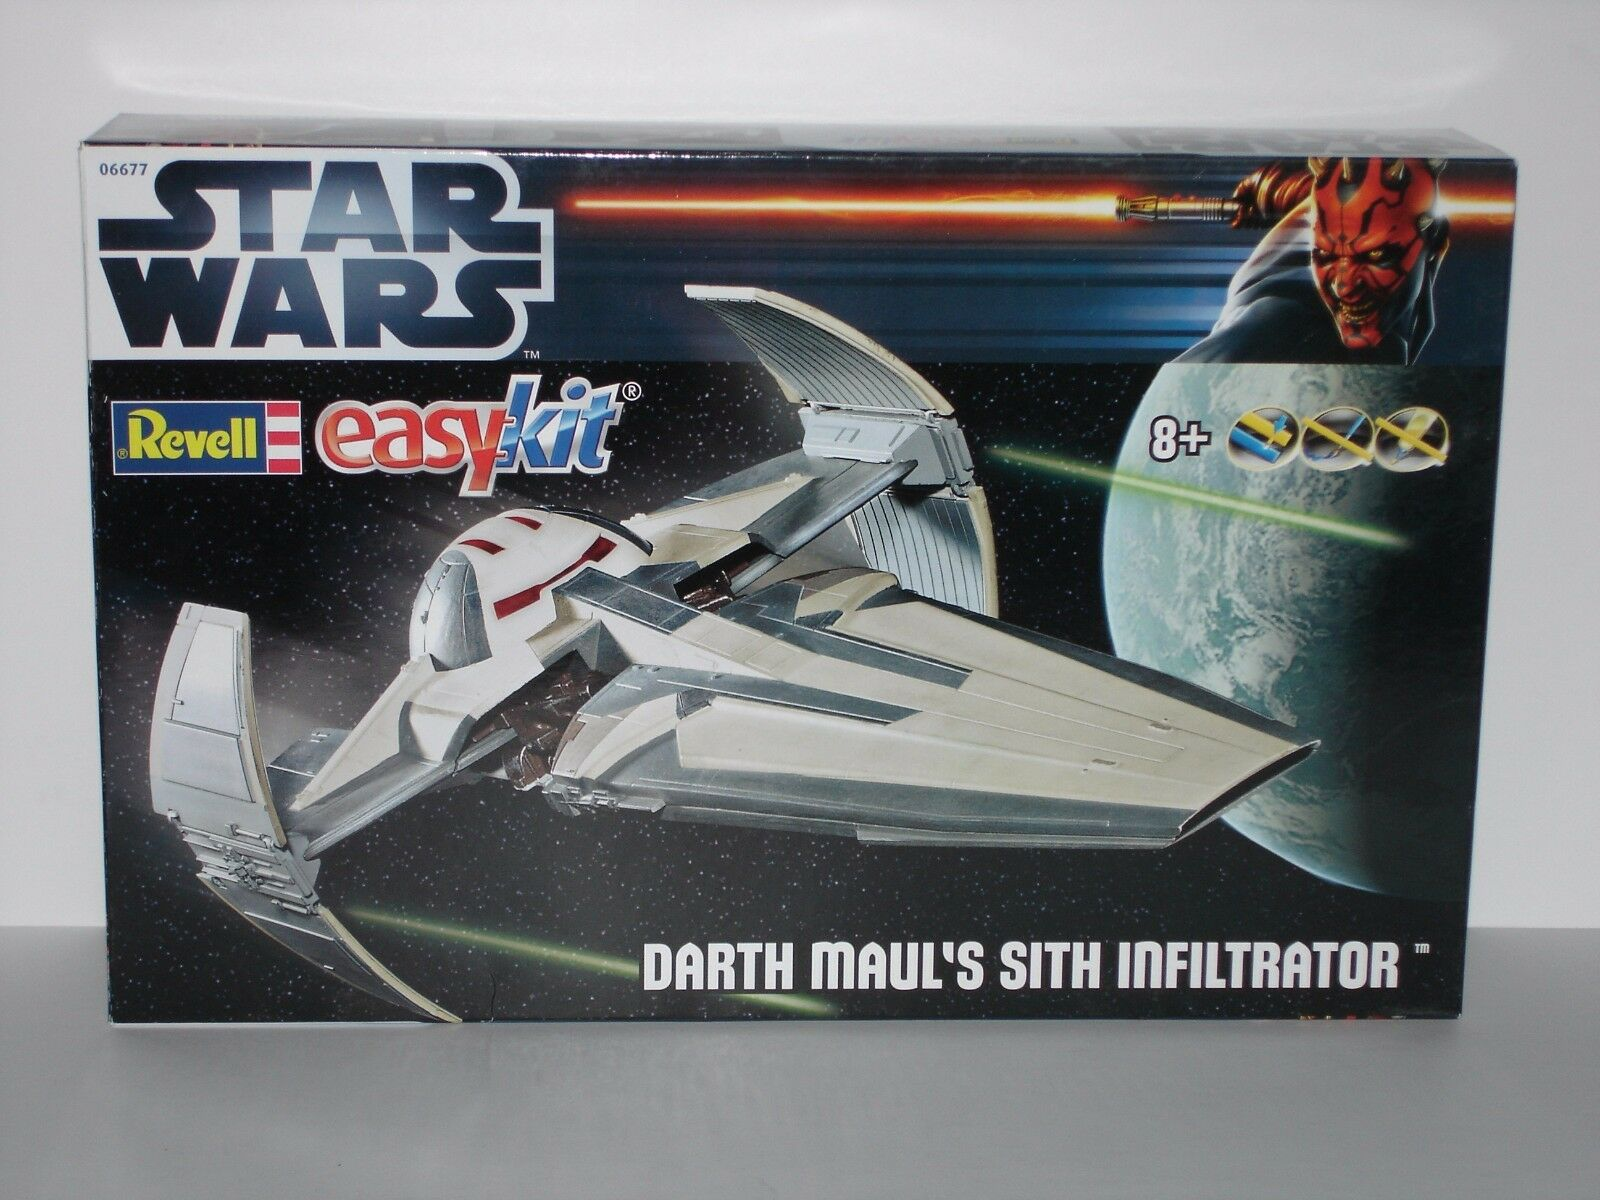 STAR WARS Sith Infiltrator (Episode 1) - Easykit - Revell 06677